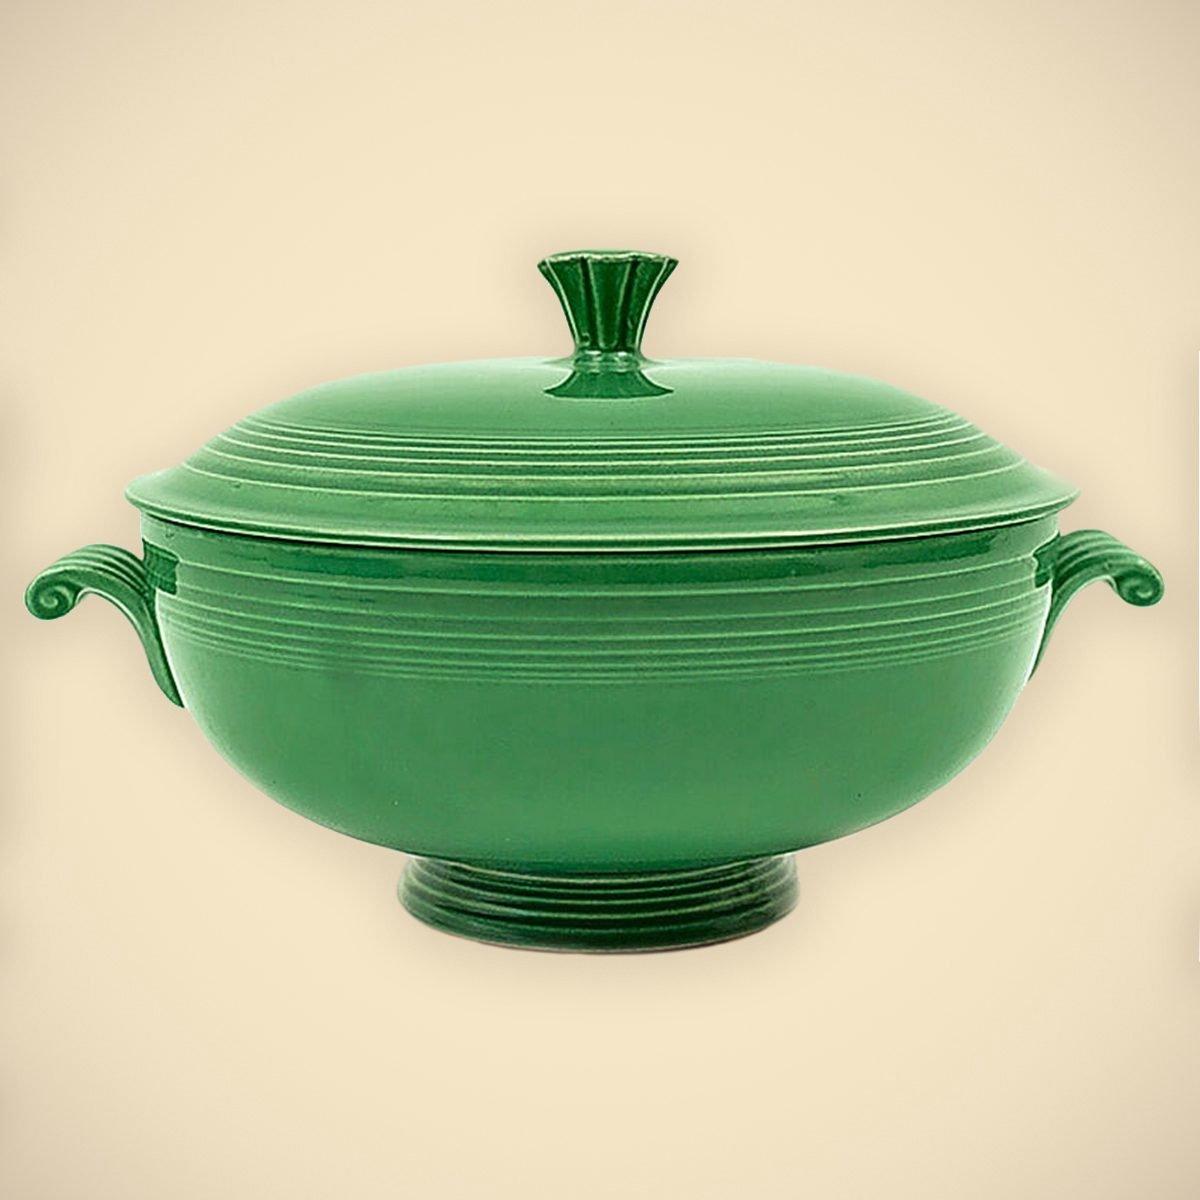 fiesta Iconic design casserole dish